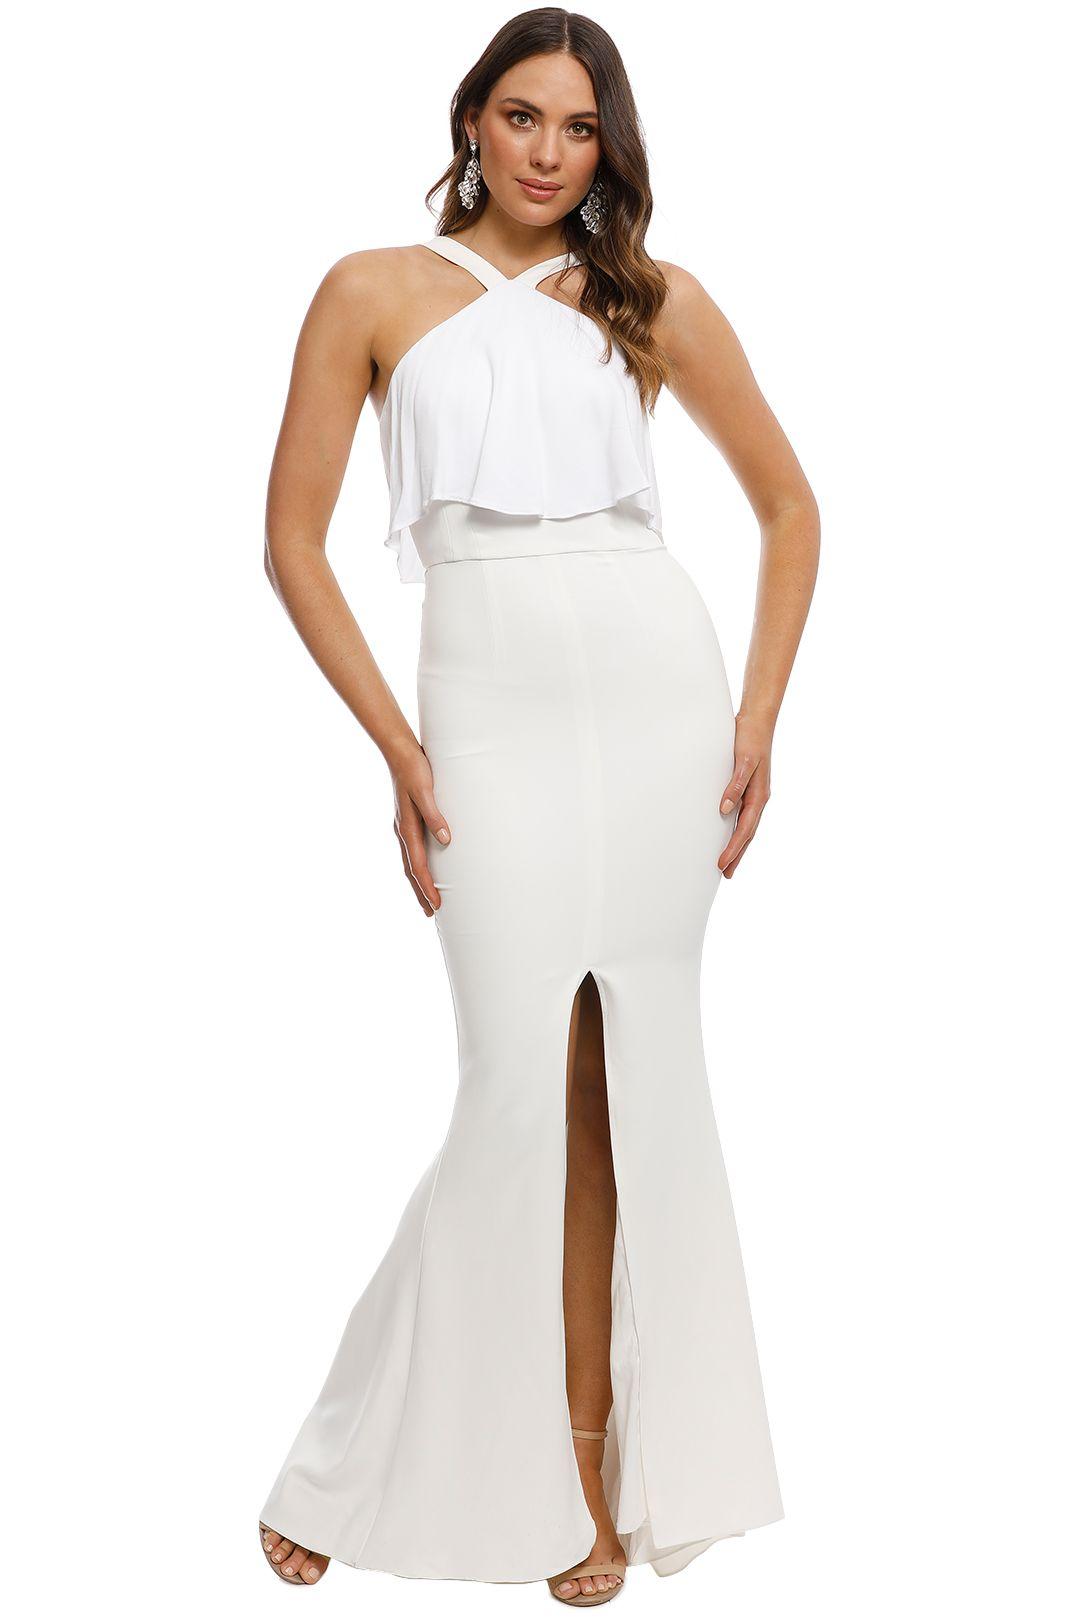 Unspoken - Rococo Ruffle Dress - Ivory - Front